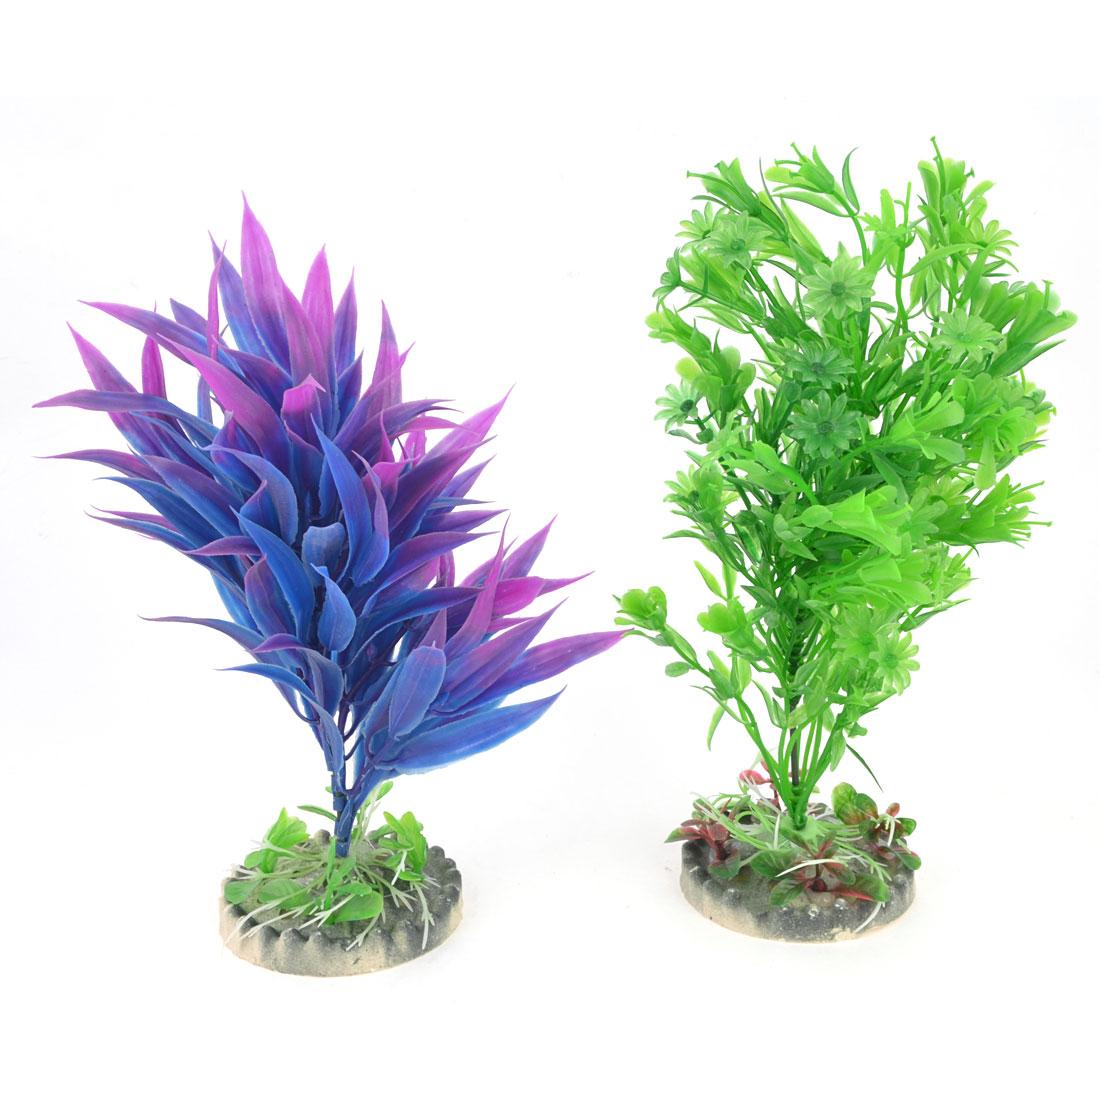 Fish Tank Fuchsia Blue Artificial Water Grass Ornament 23cm 22cm Height 2 PCS